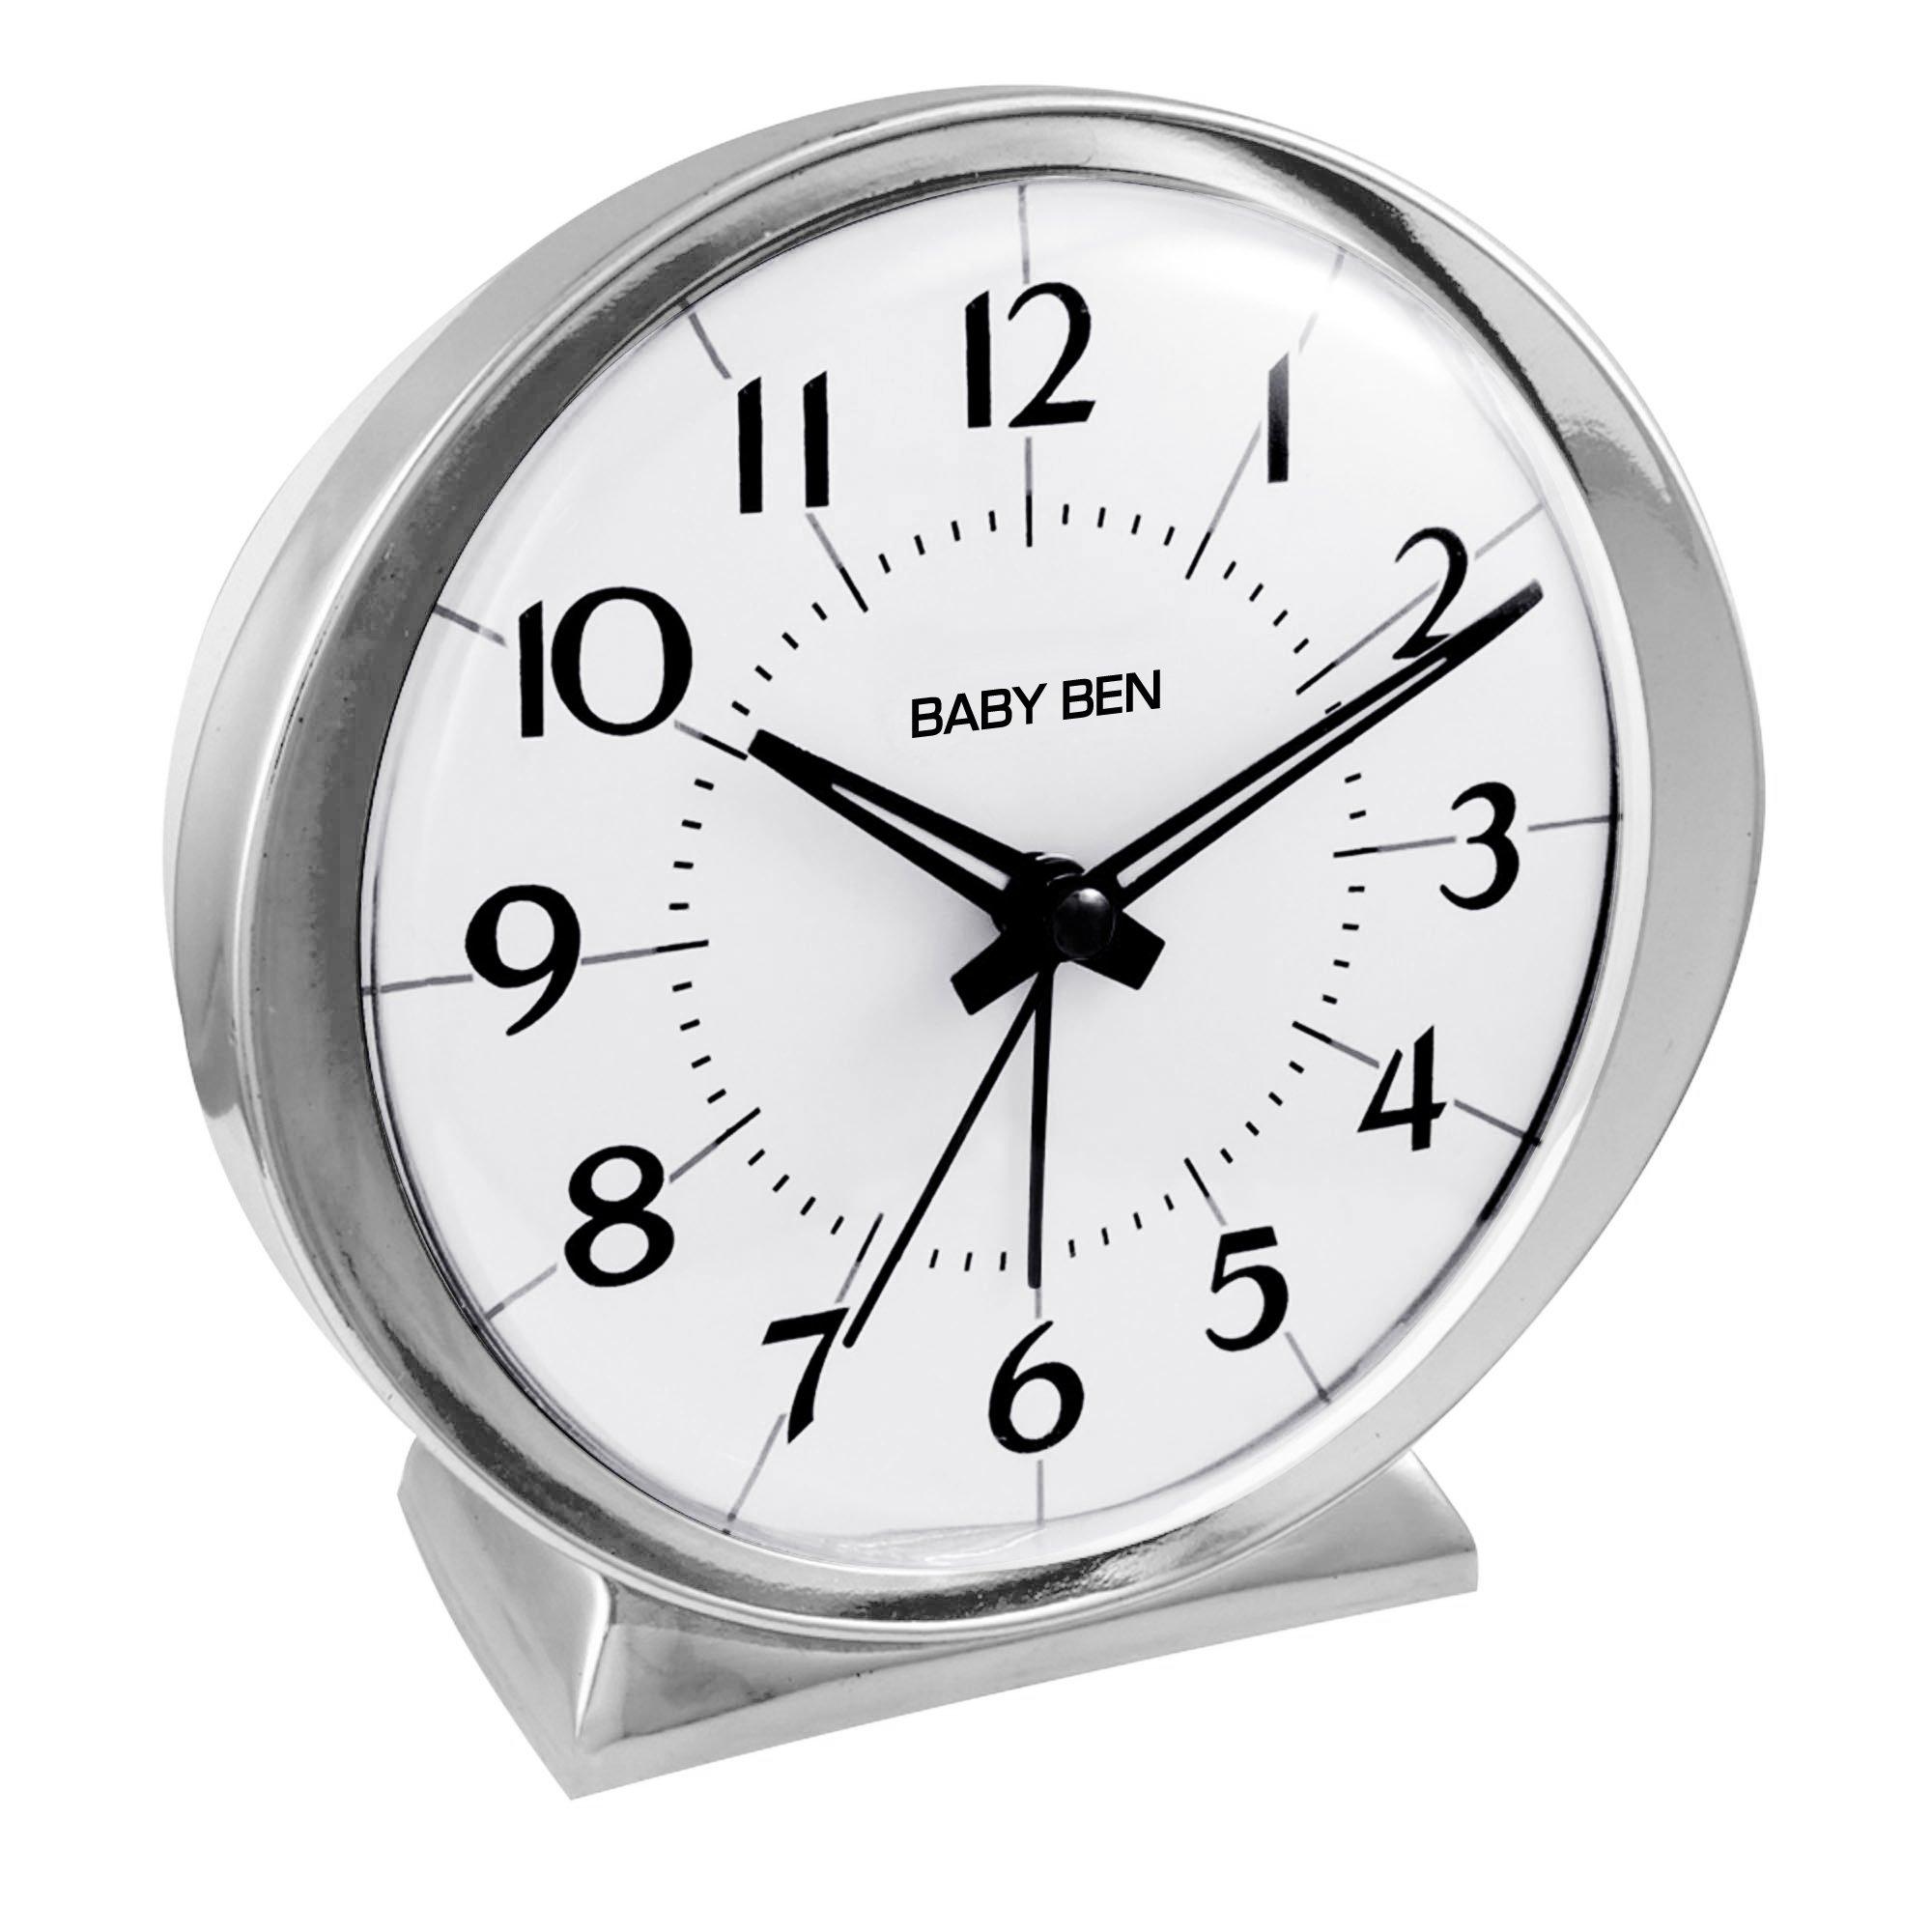 Westclox 11611 Authentic 1964 Baby Ben Classic Alarm Clock